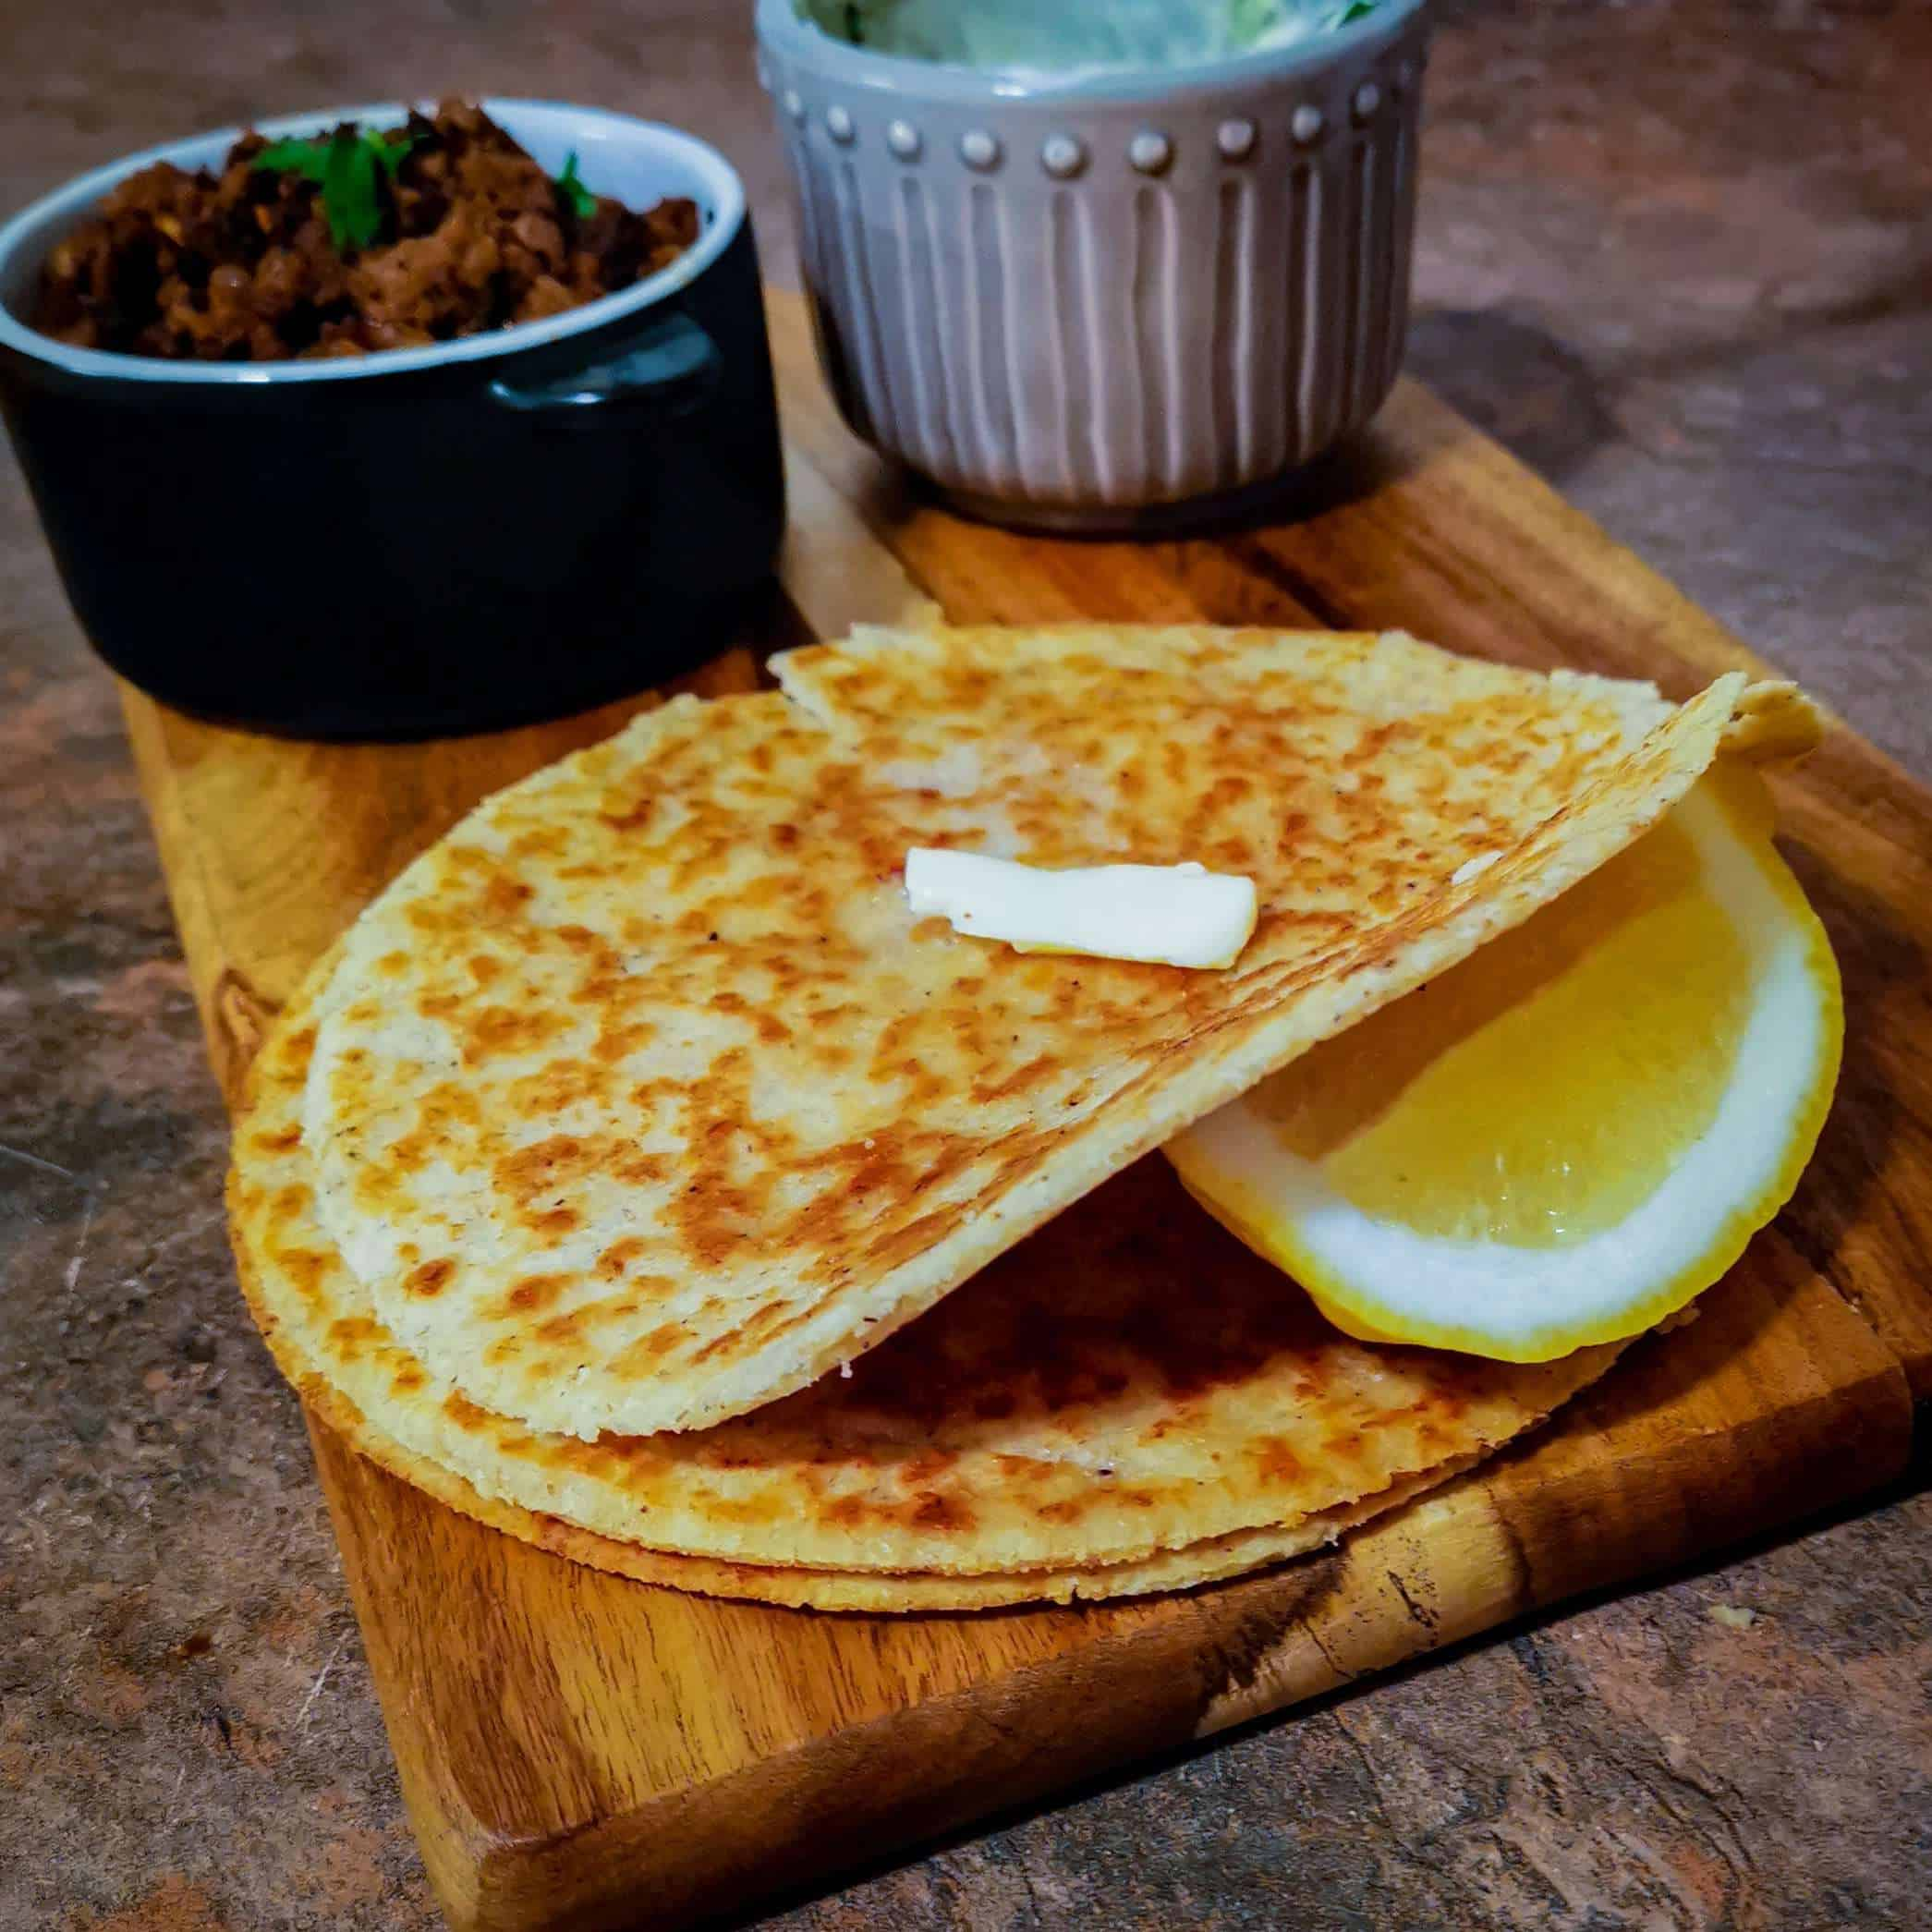 Keto tortilla fried crispy